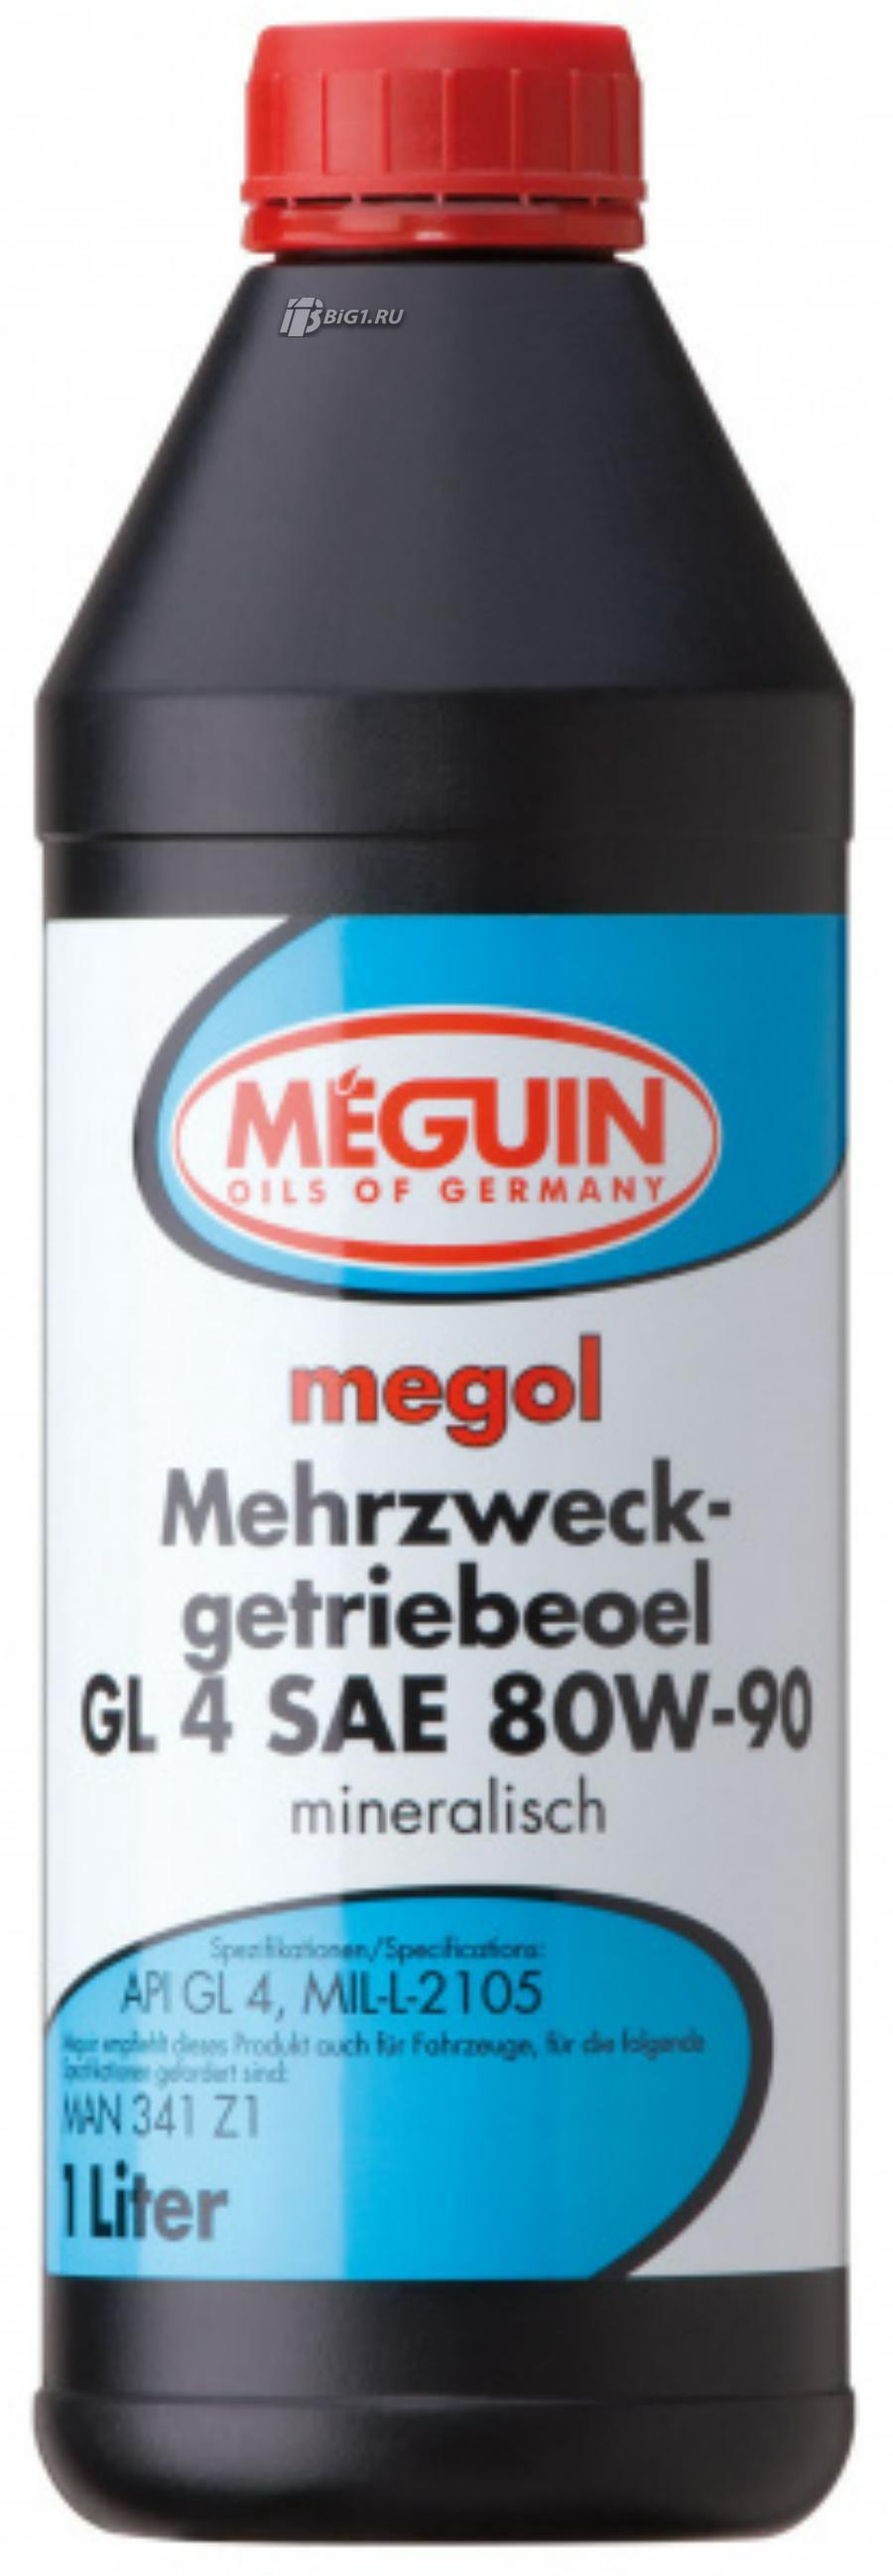 MEGUIN Mehrzweck-Getriebeoel GL4 80W-90